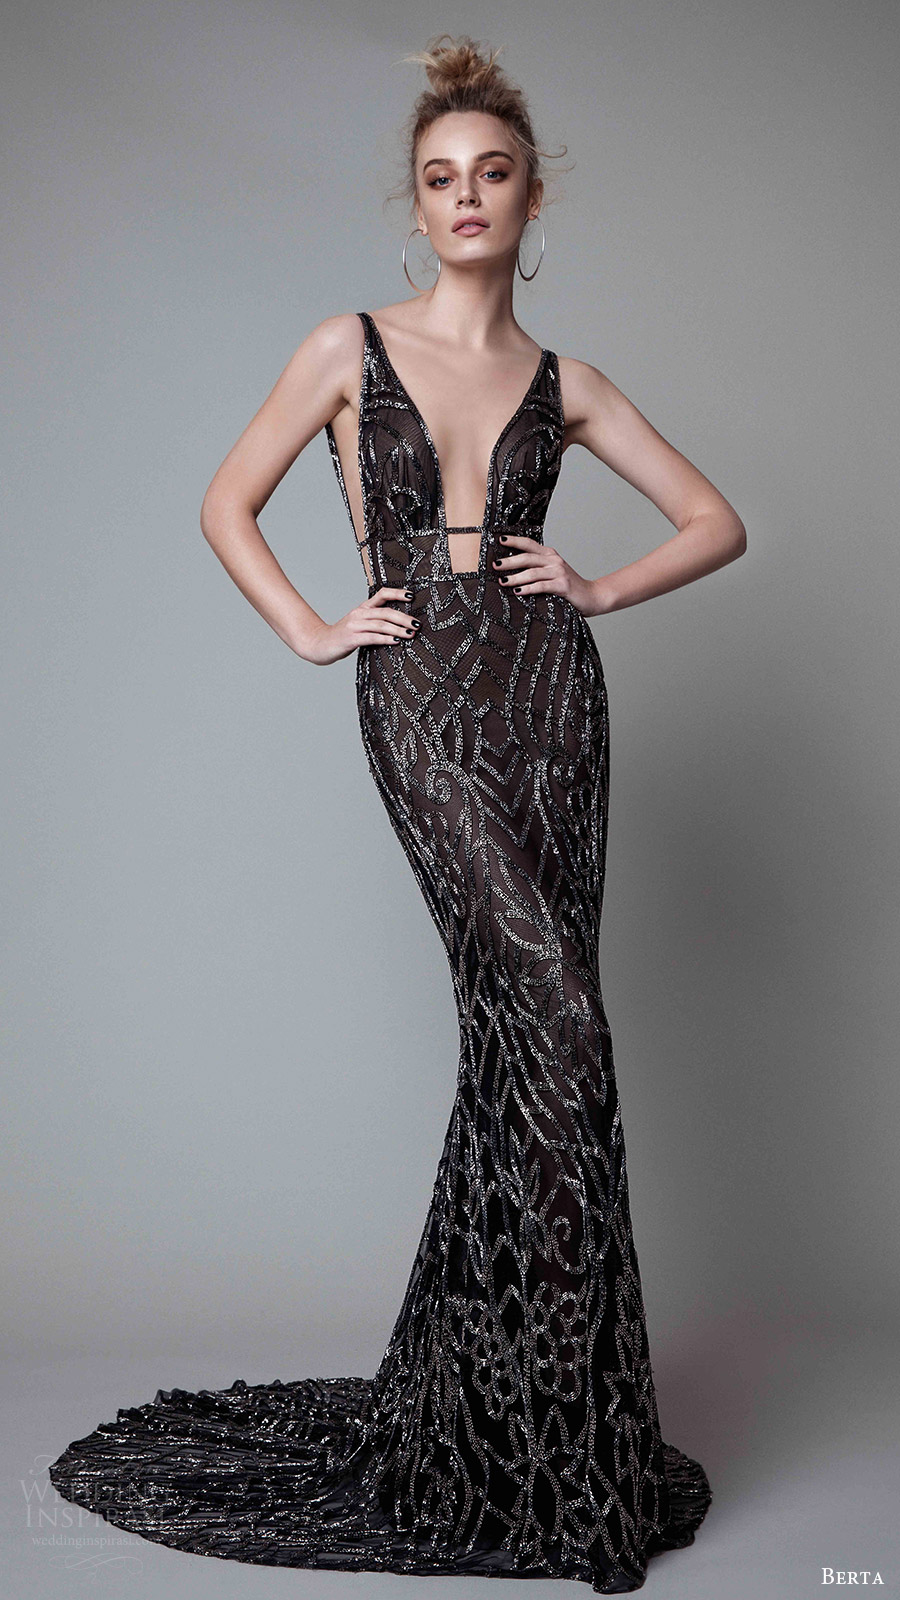 berta rtw fall 2017 (17 05) sleeveless deep vneck sheath black evening dress embellished mv